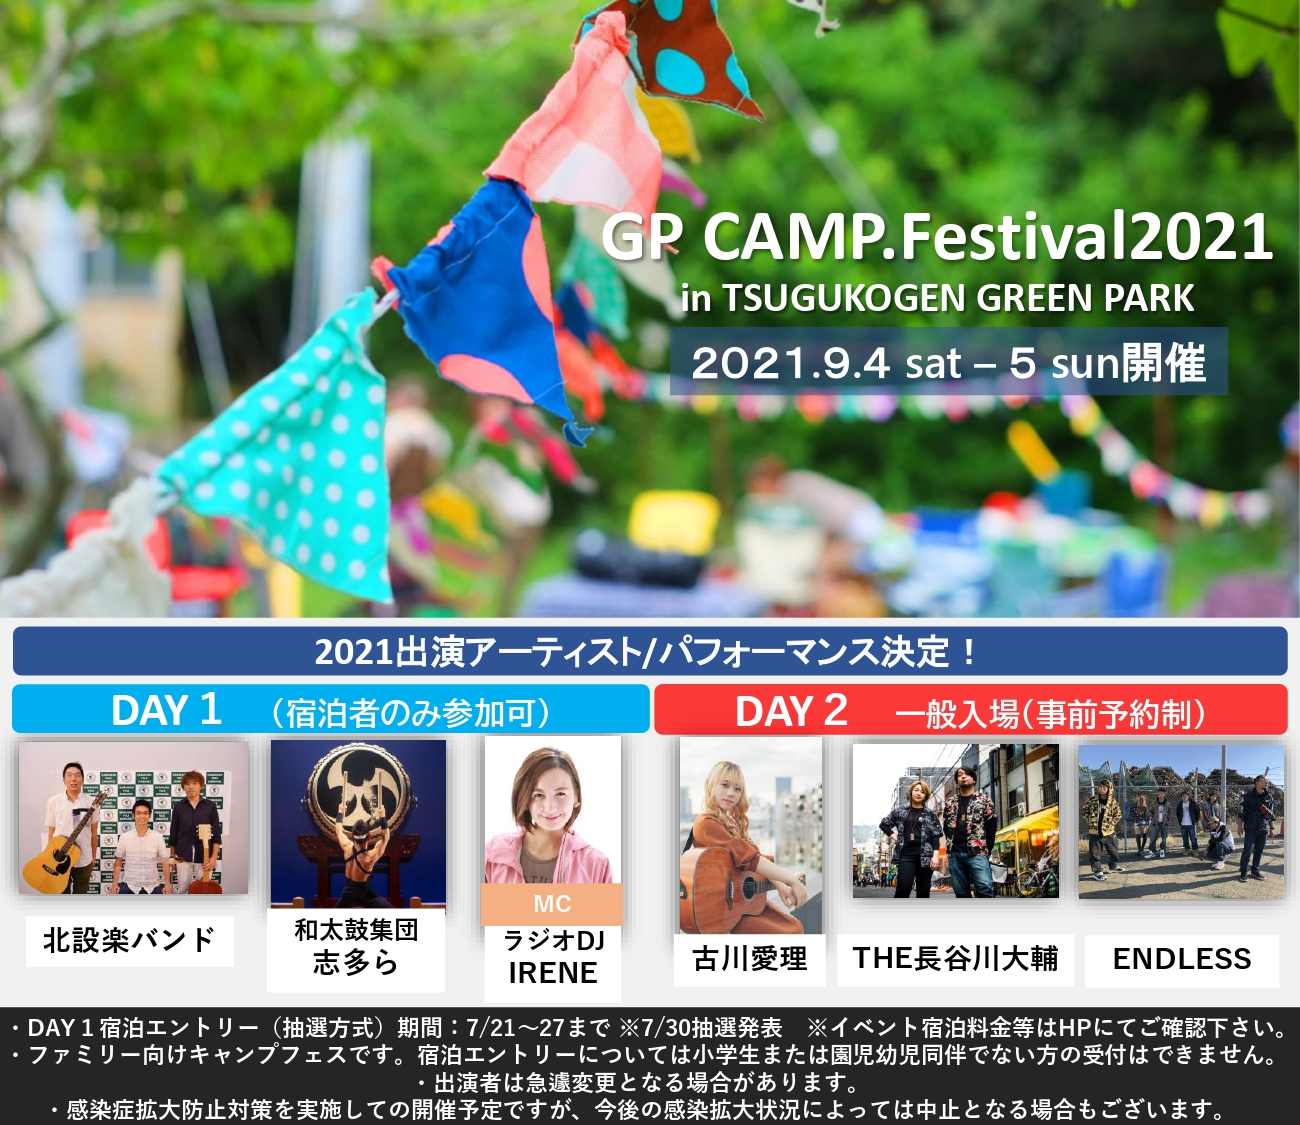 GP CAMP.Festival2021開催決定!